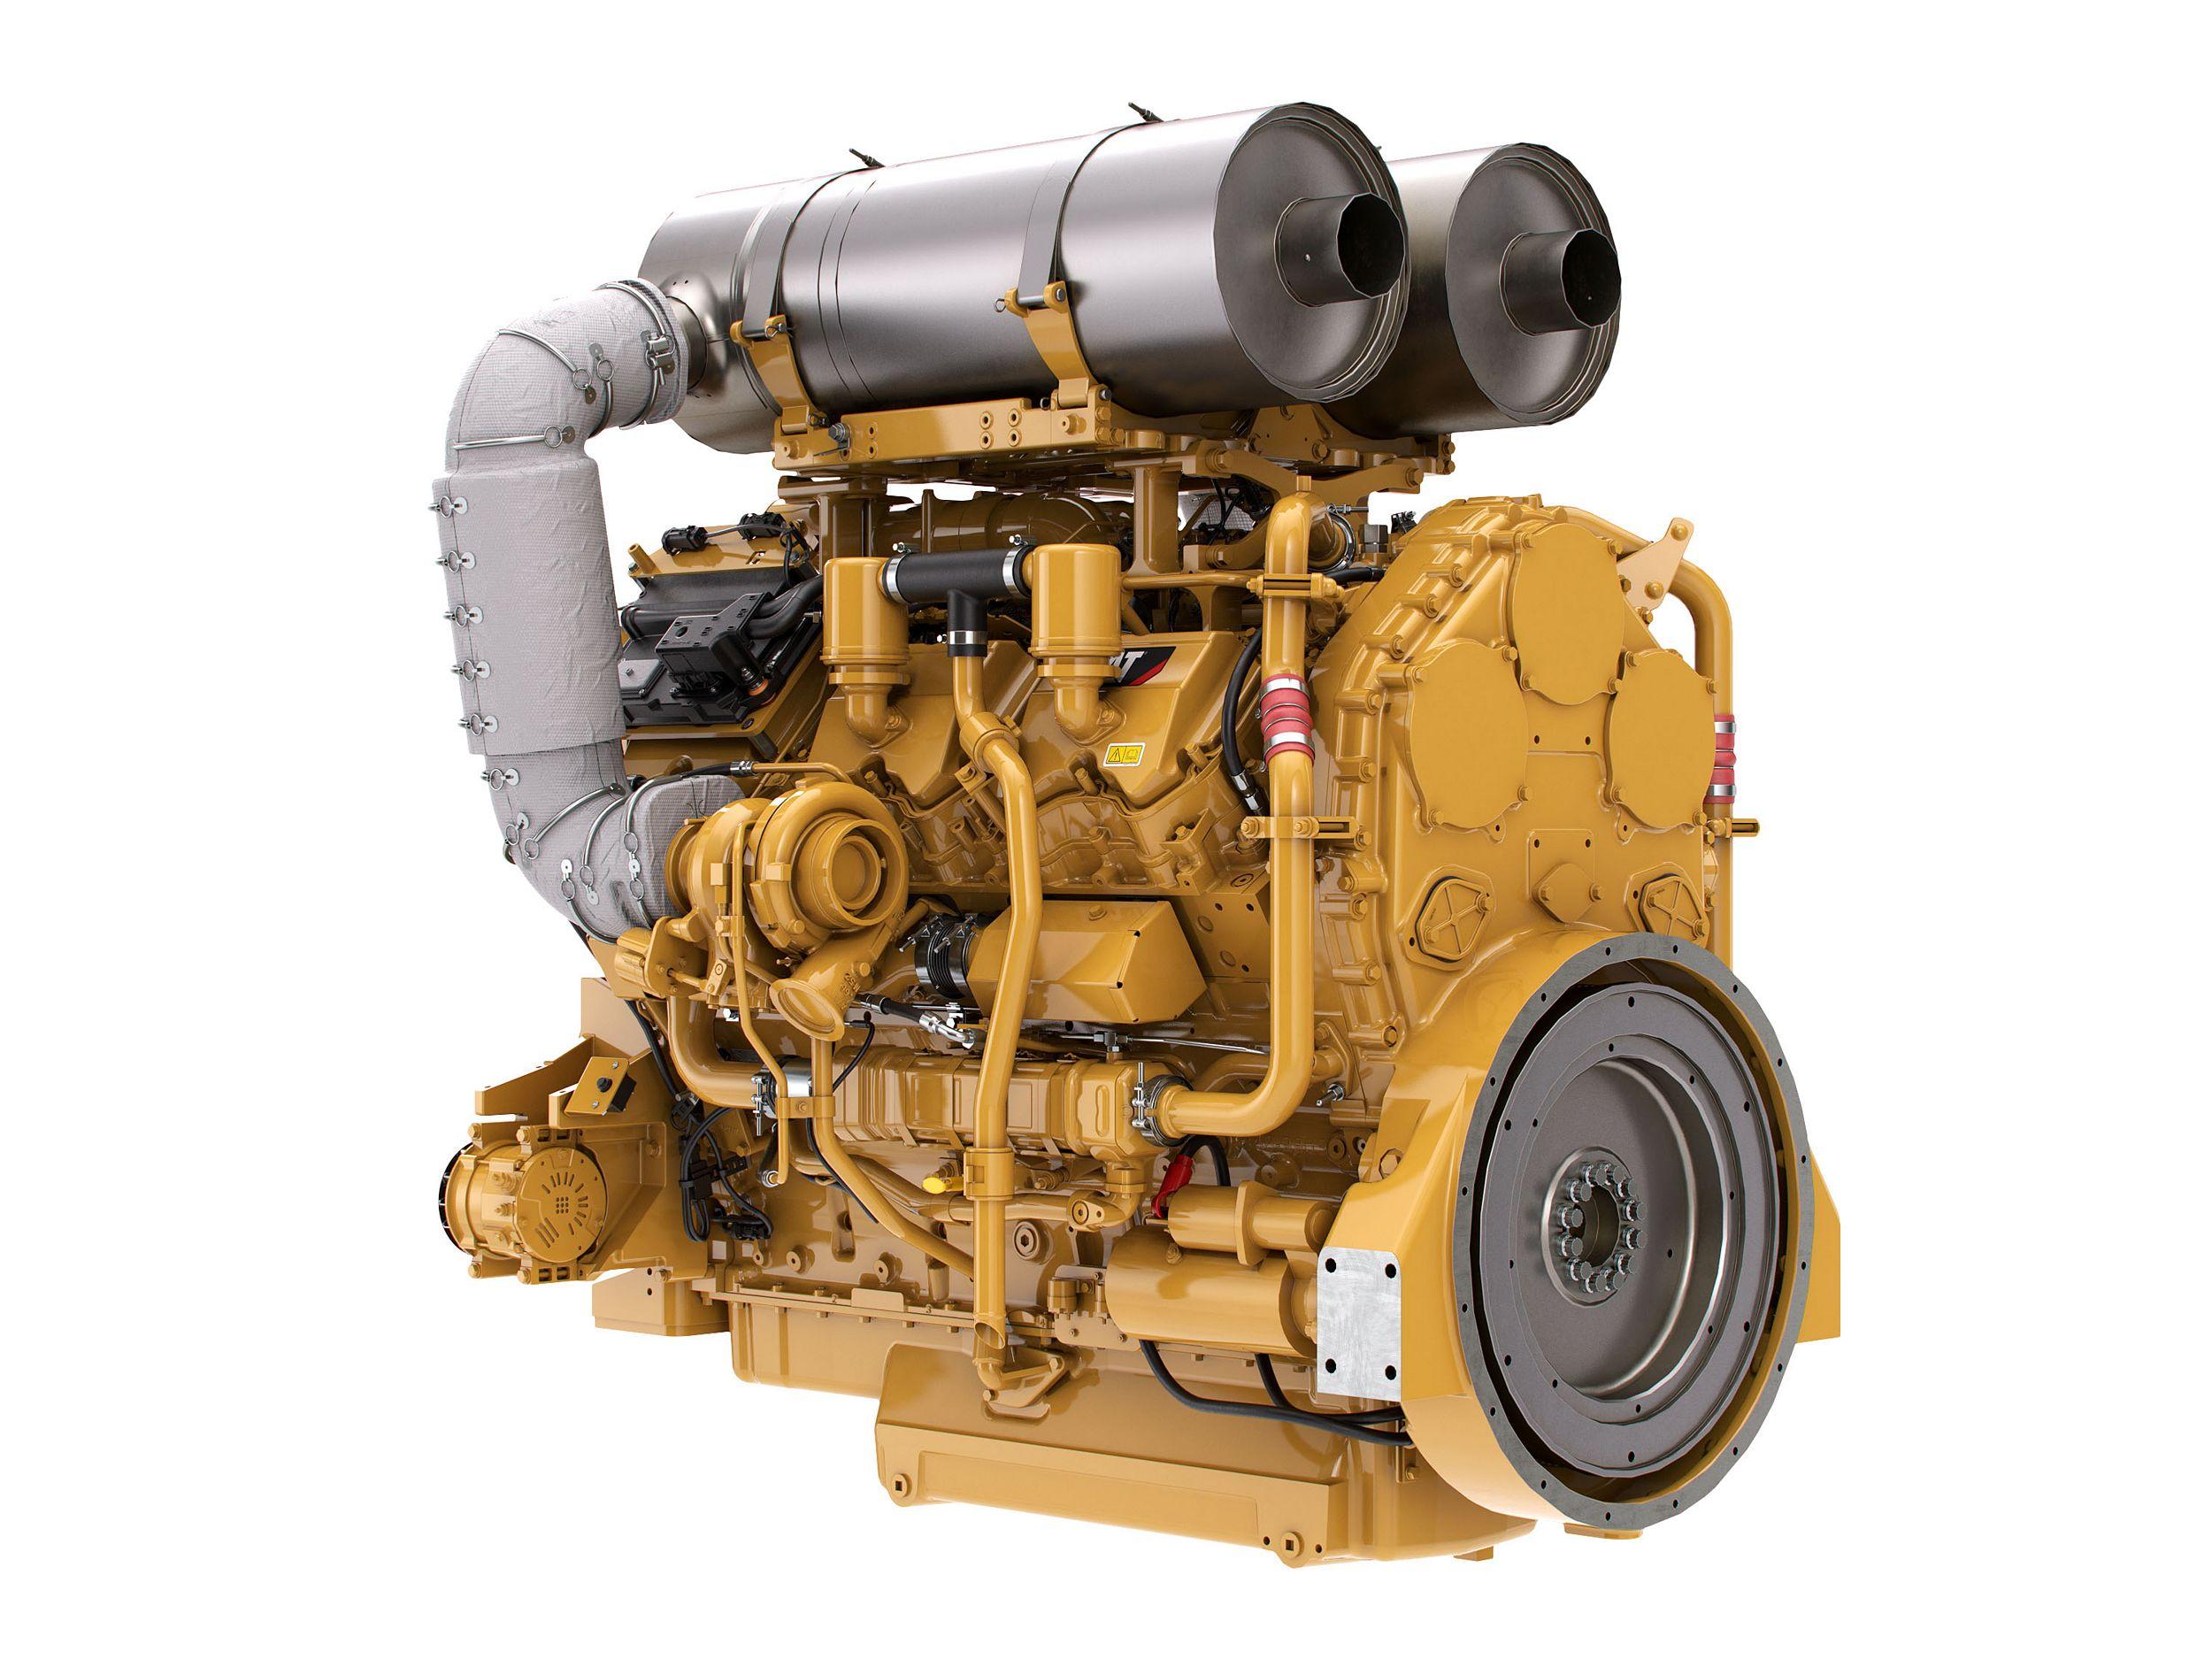 C27 Tier 4 Diesel Engines – Highly Regulated